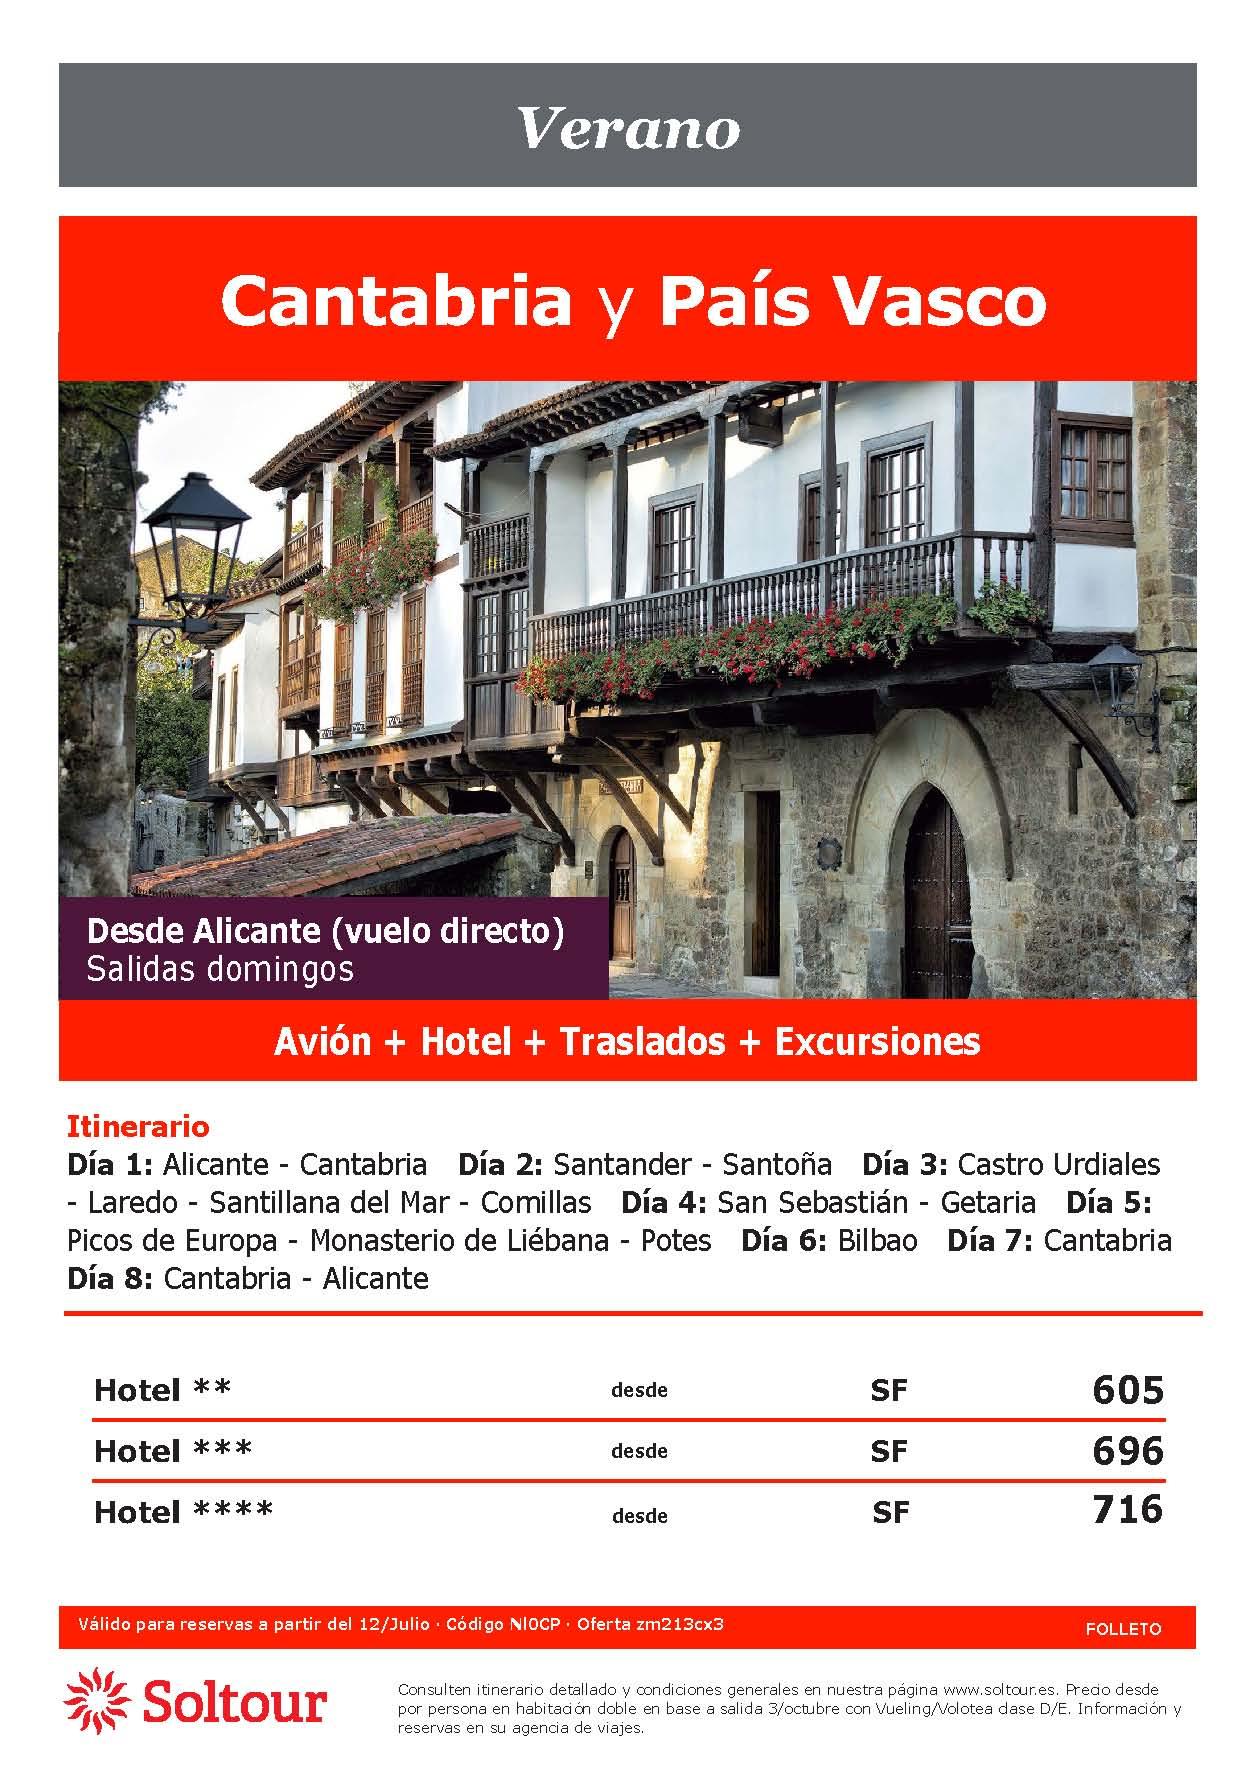 Oferta Soltour Ultima Hora Circuito en avion Cantabria y Pais Vasco desde Alicante Verano 2021